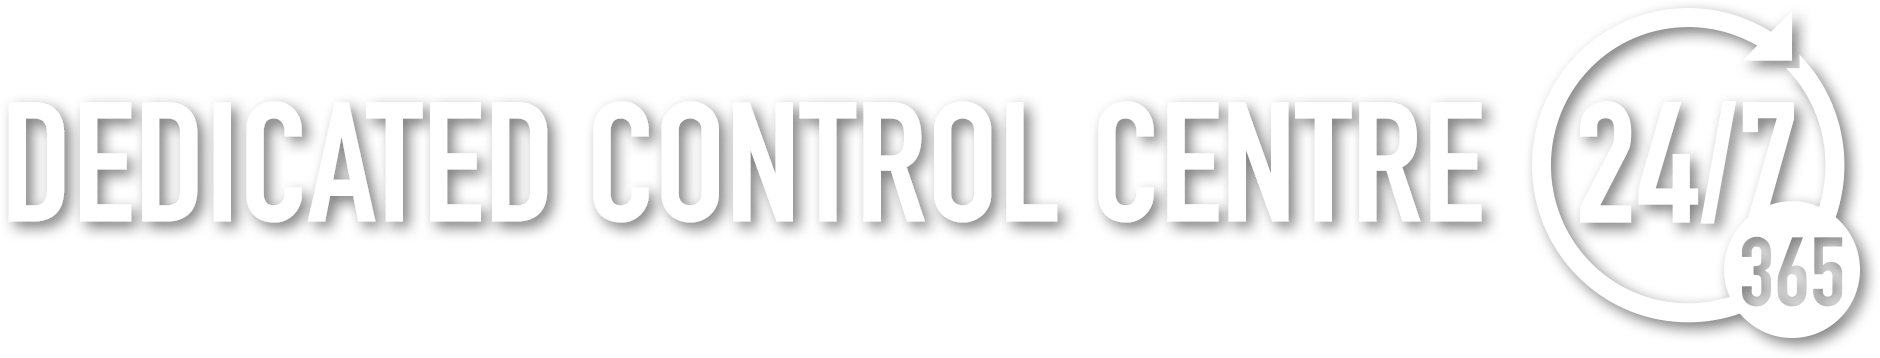 Dedicated Control Centre